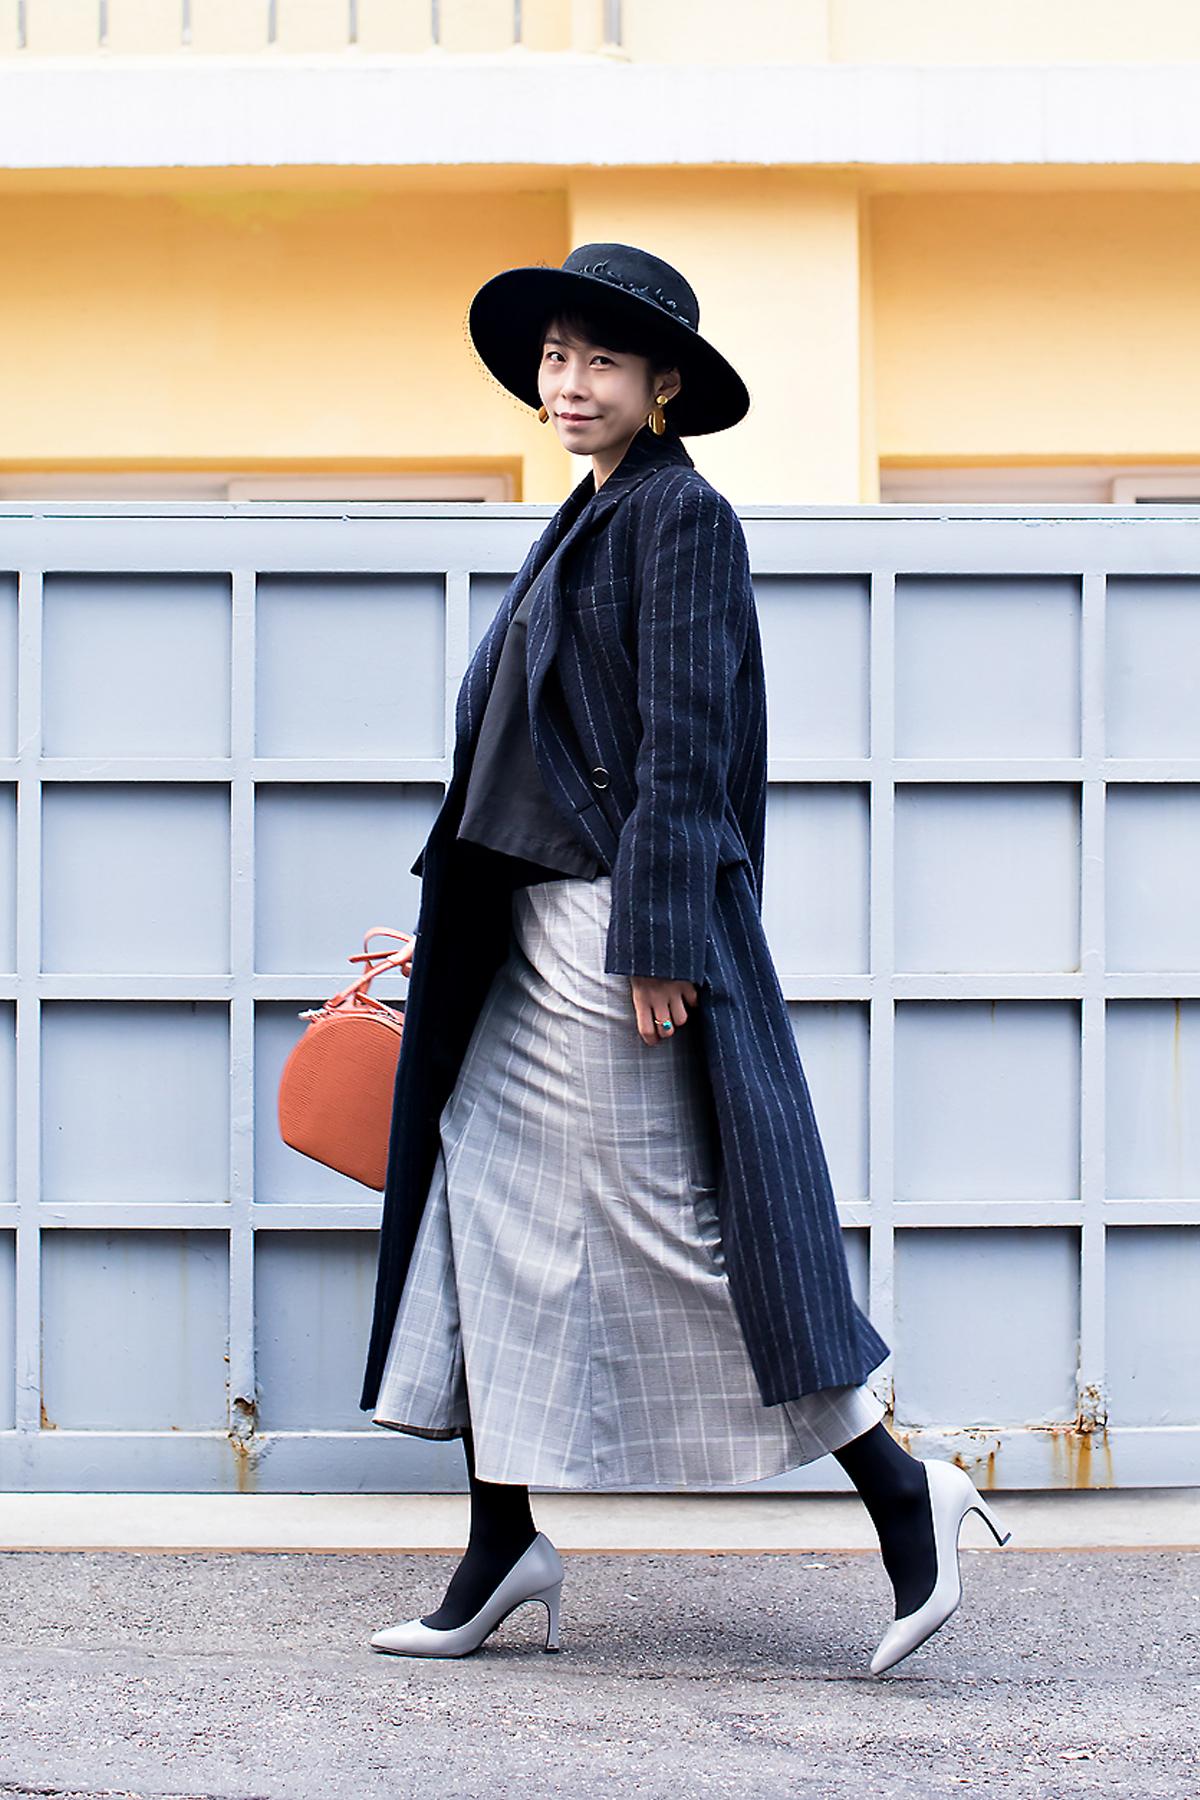 Jung Jinhee, Street Fashion 2017 in SEOUL.jpg